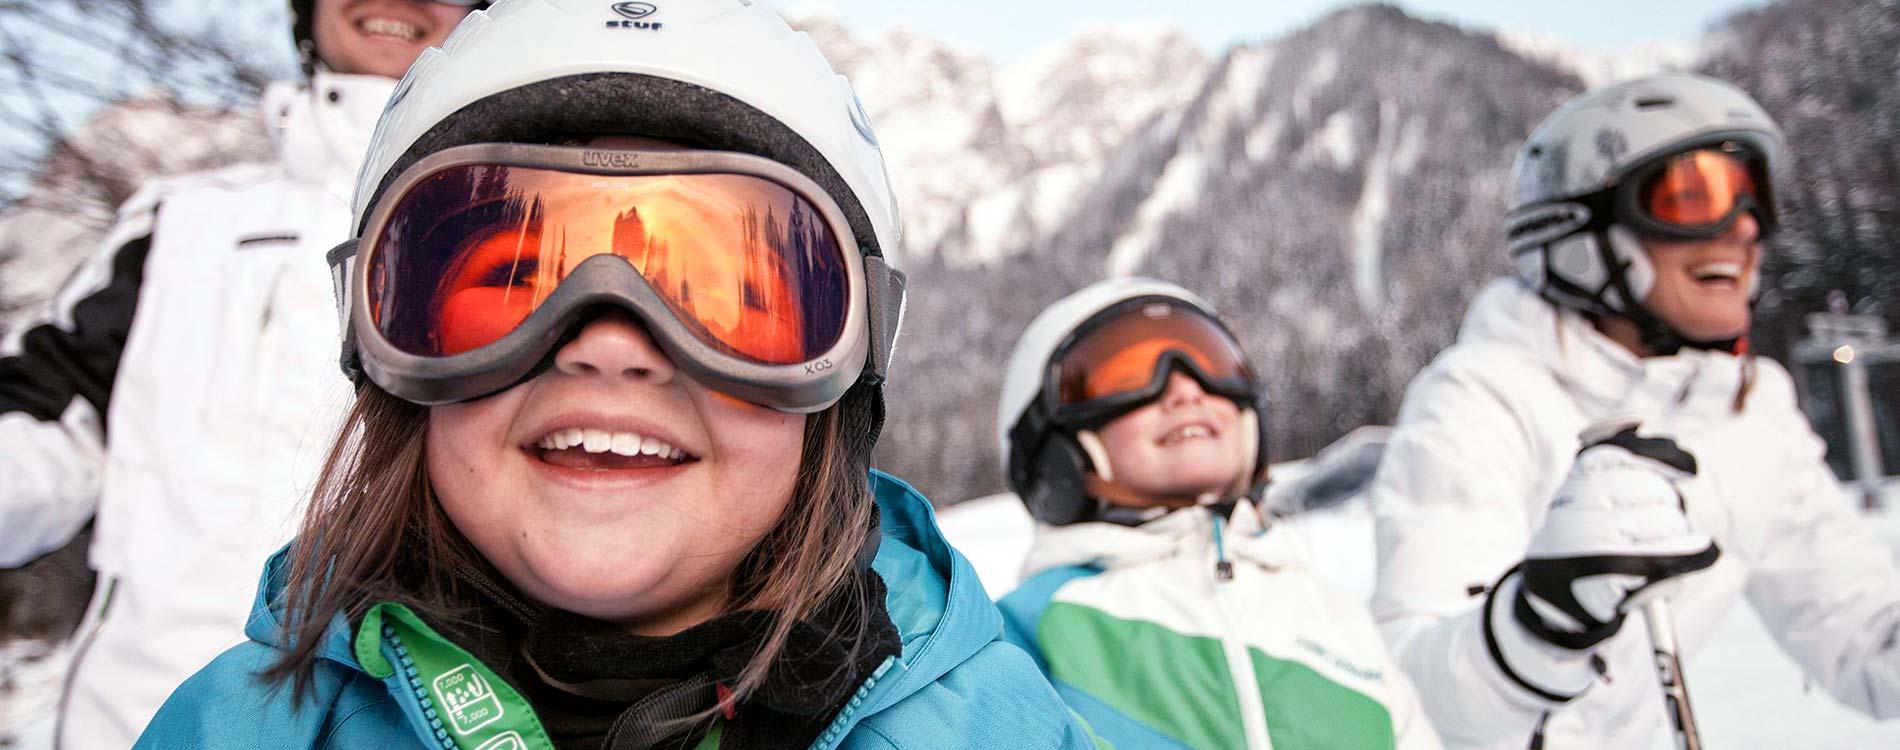 Skiing in december Familienhotel TIROLERHOF 4-Sterne Ehrwald Zugspitzarena Tirol_Austria Region Winter Ski